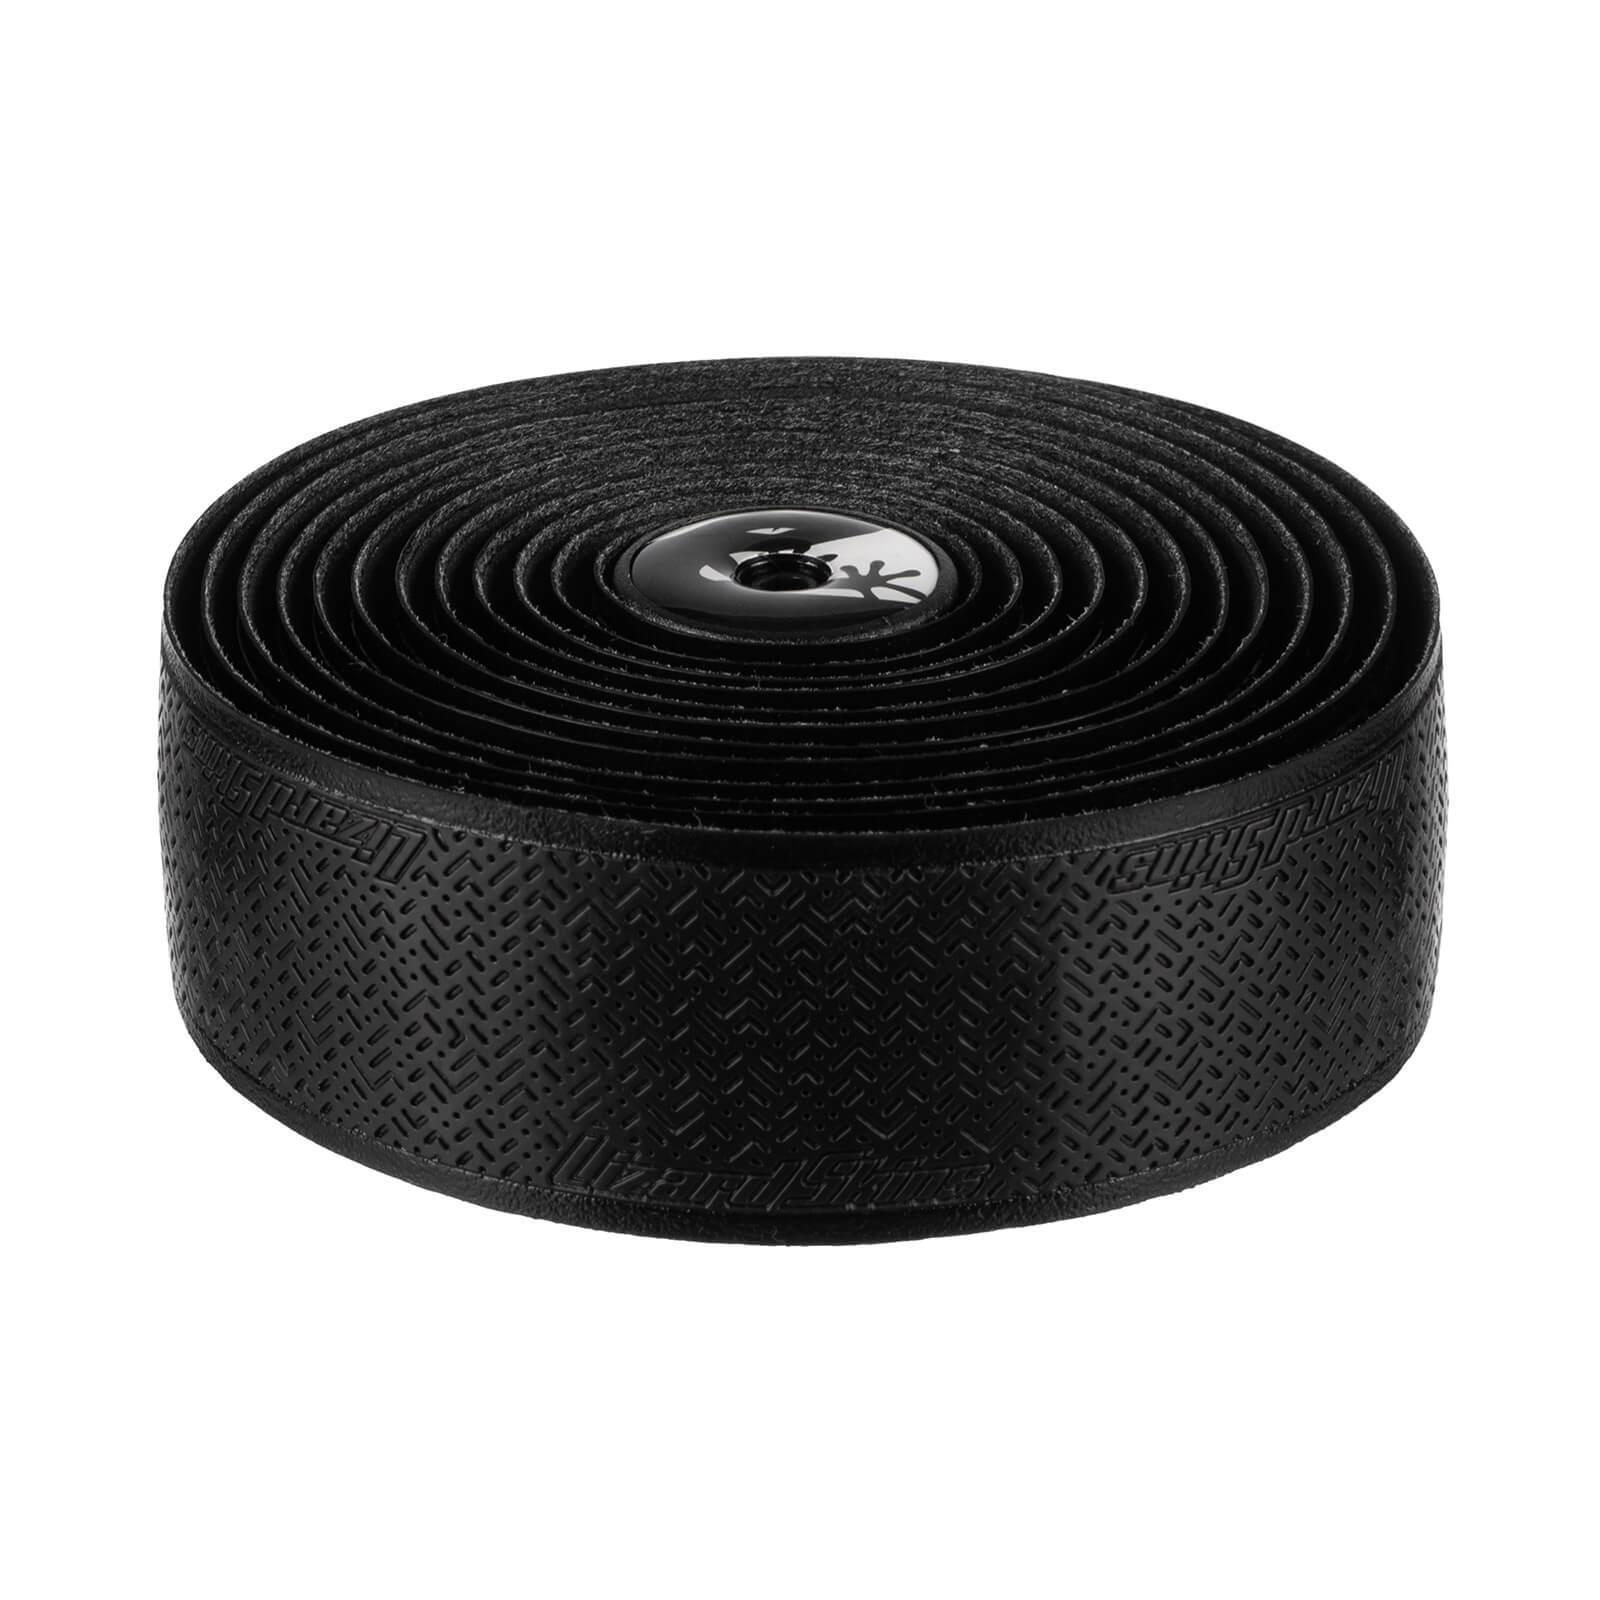 Lizard Skins DSP Bar Tape V2 - 2.5MM - Black £24.29 @ ProBikeKit